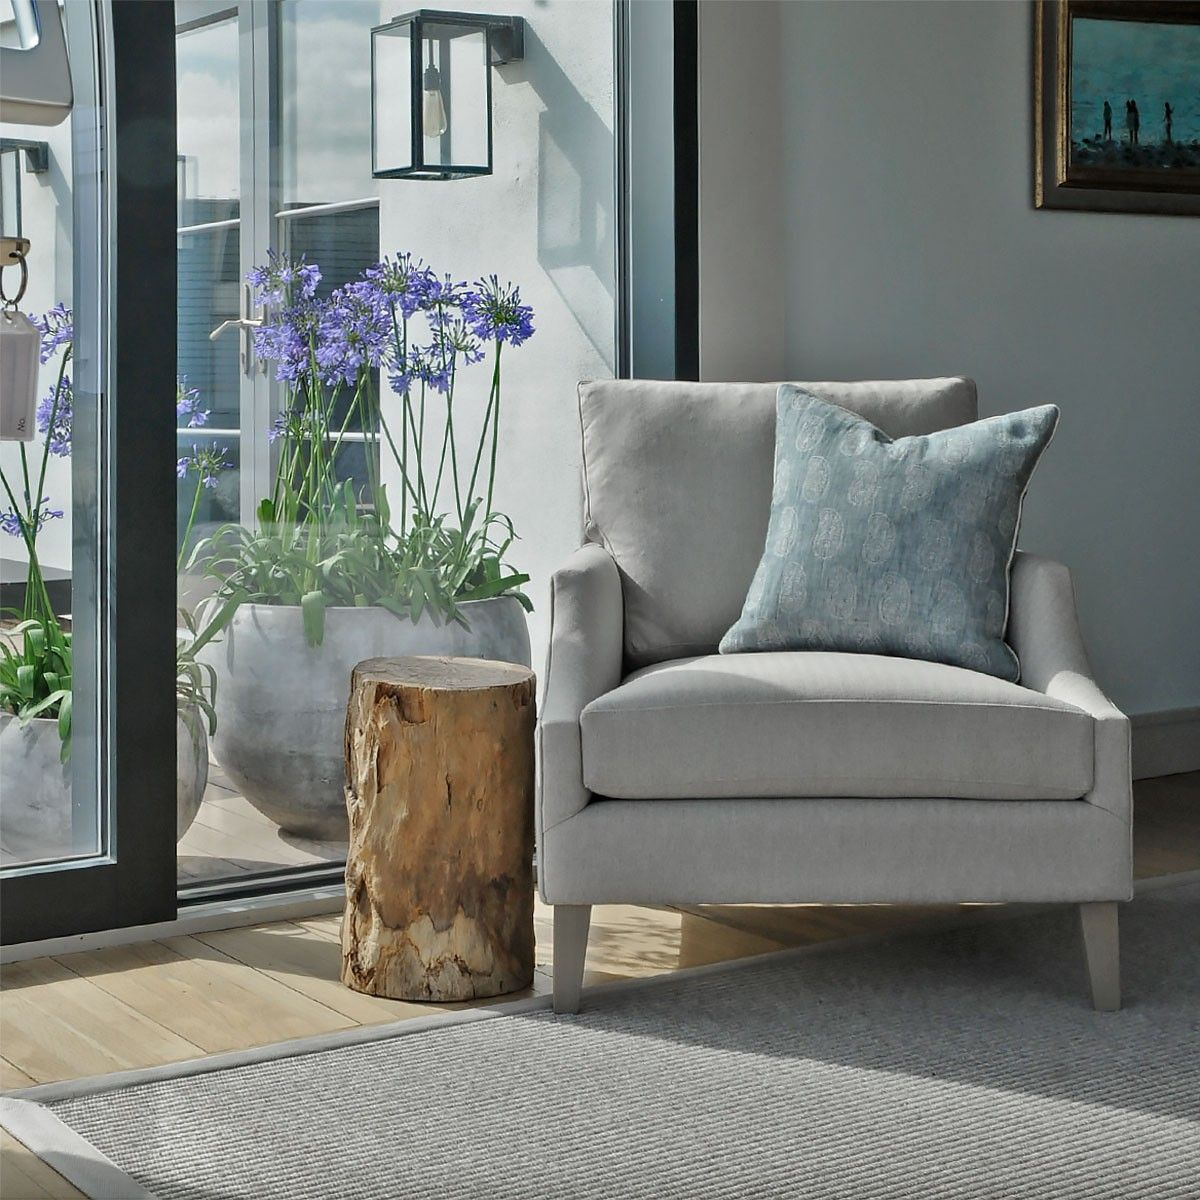 Dan's Comfy Chair in 2019 | Comfy armchair, Armchair, Comfy